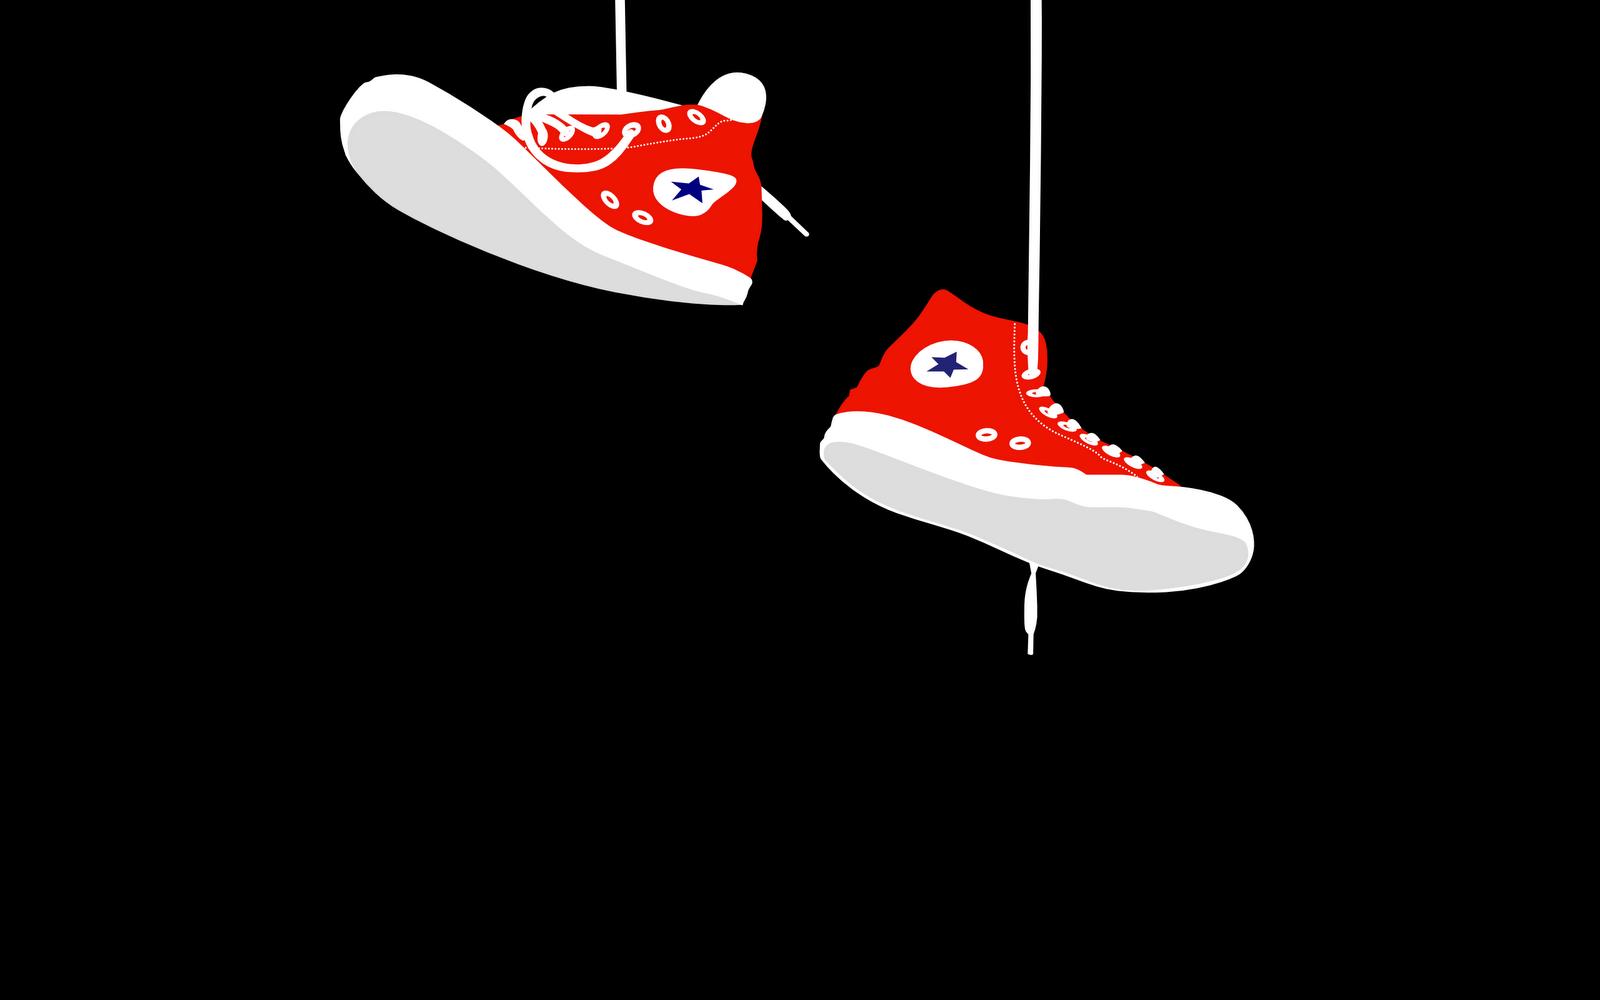 Converse All Star HD Logo Wallpapers | Desktop Wallpapers